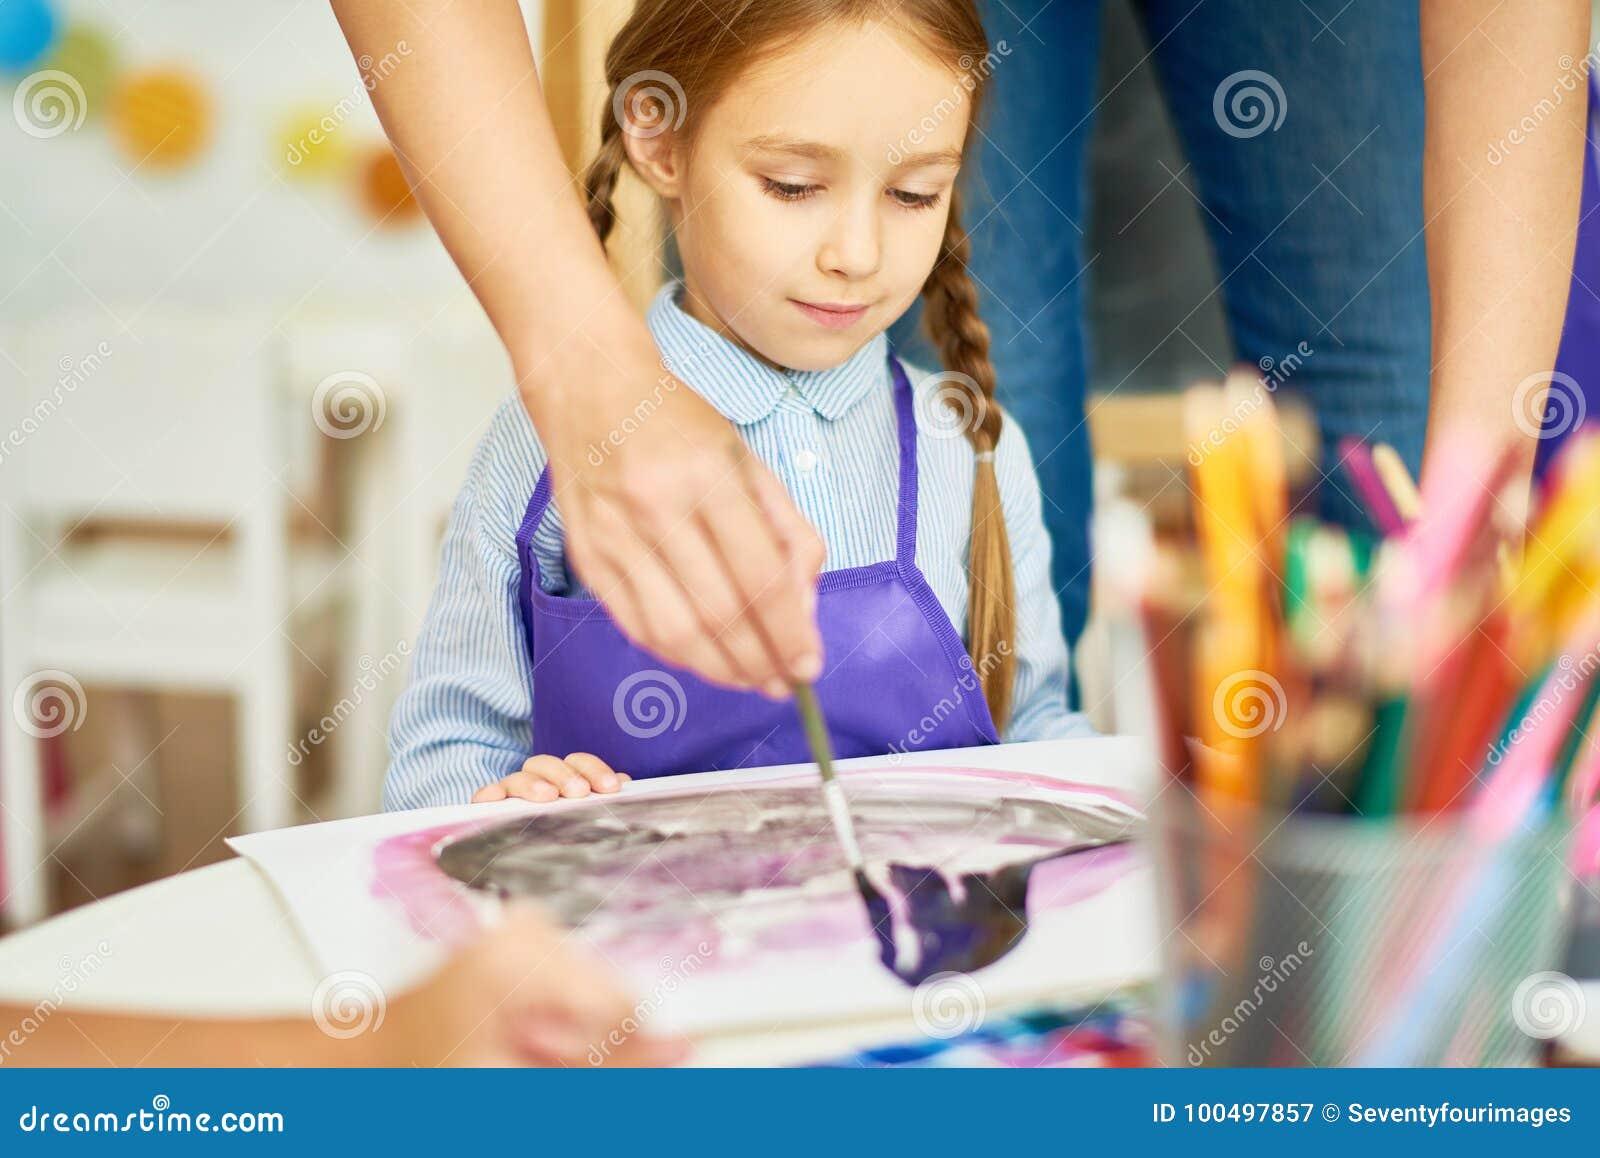 Little Girl in Art Class